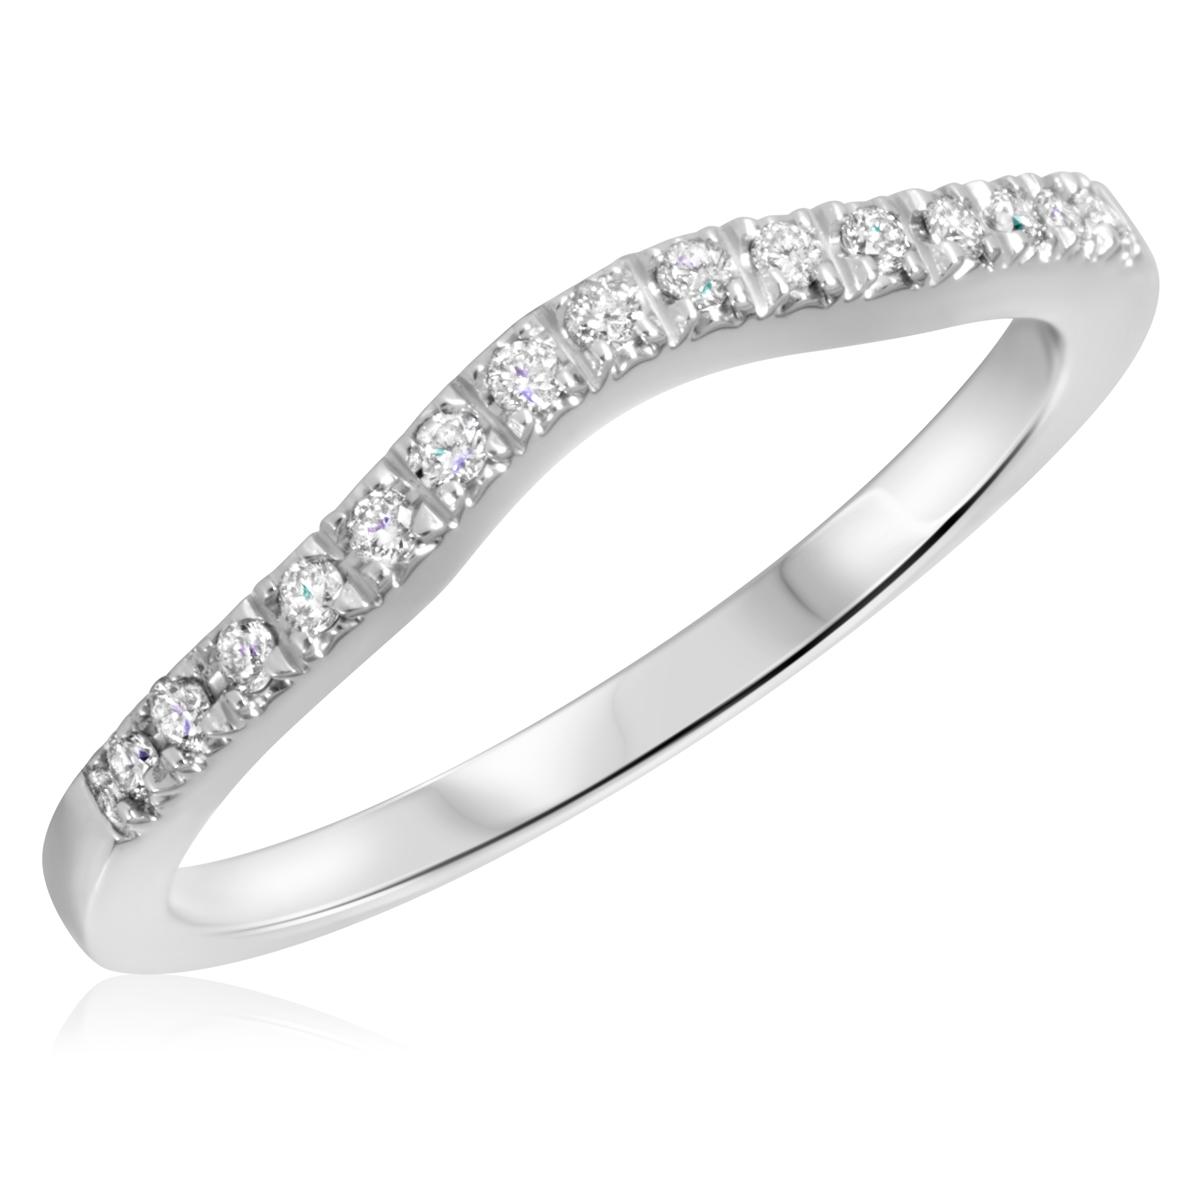 1/8 Carat T.W. Round Cut Diamond Ladies Wedding Band 14K White Gold- Size 8